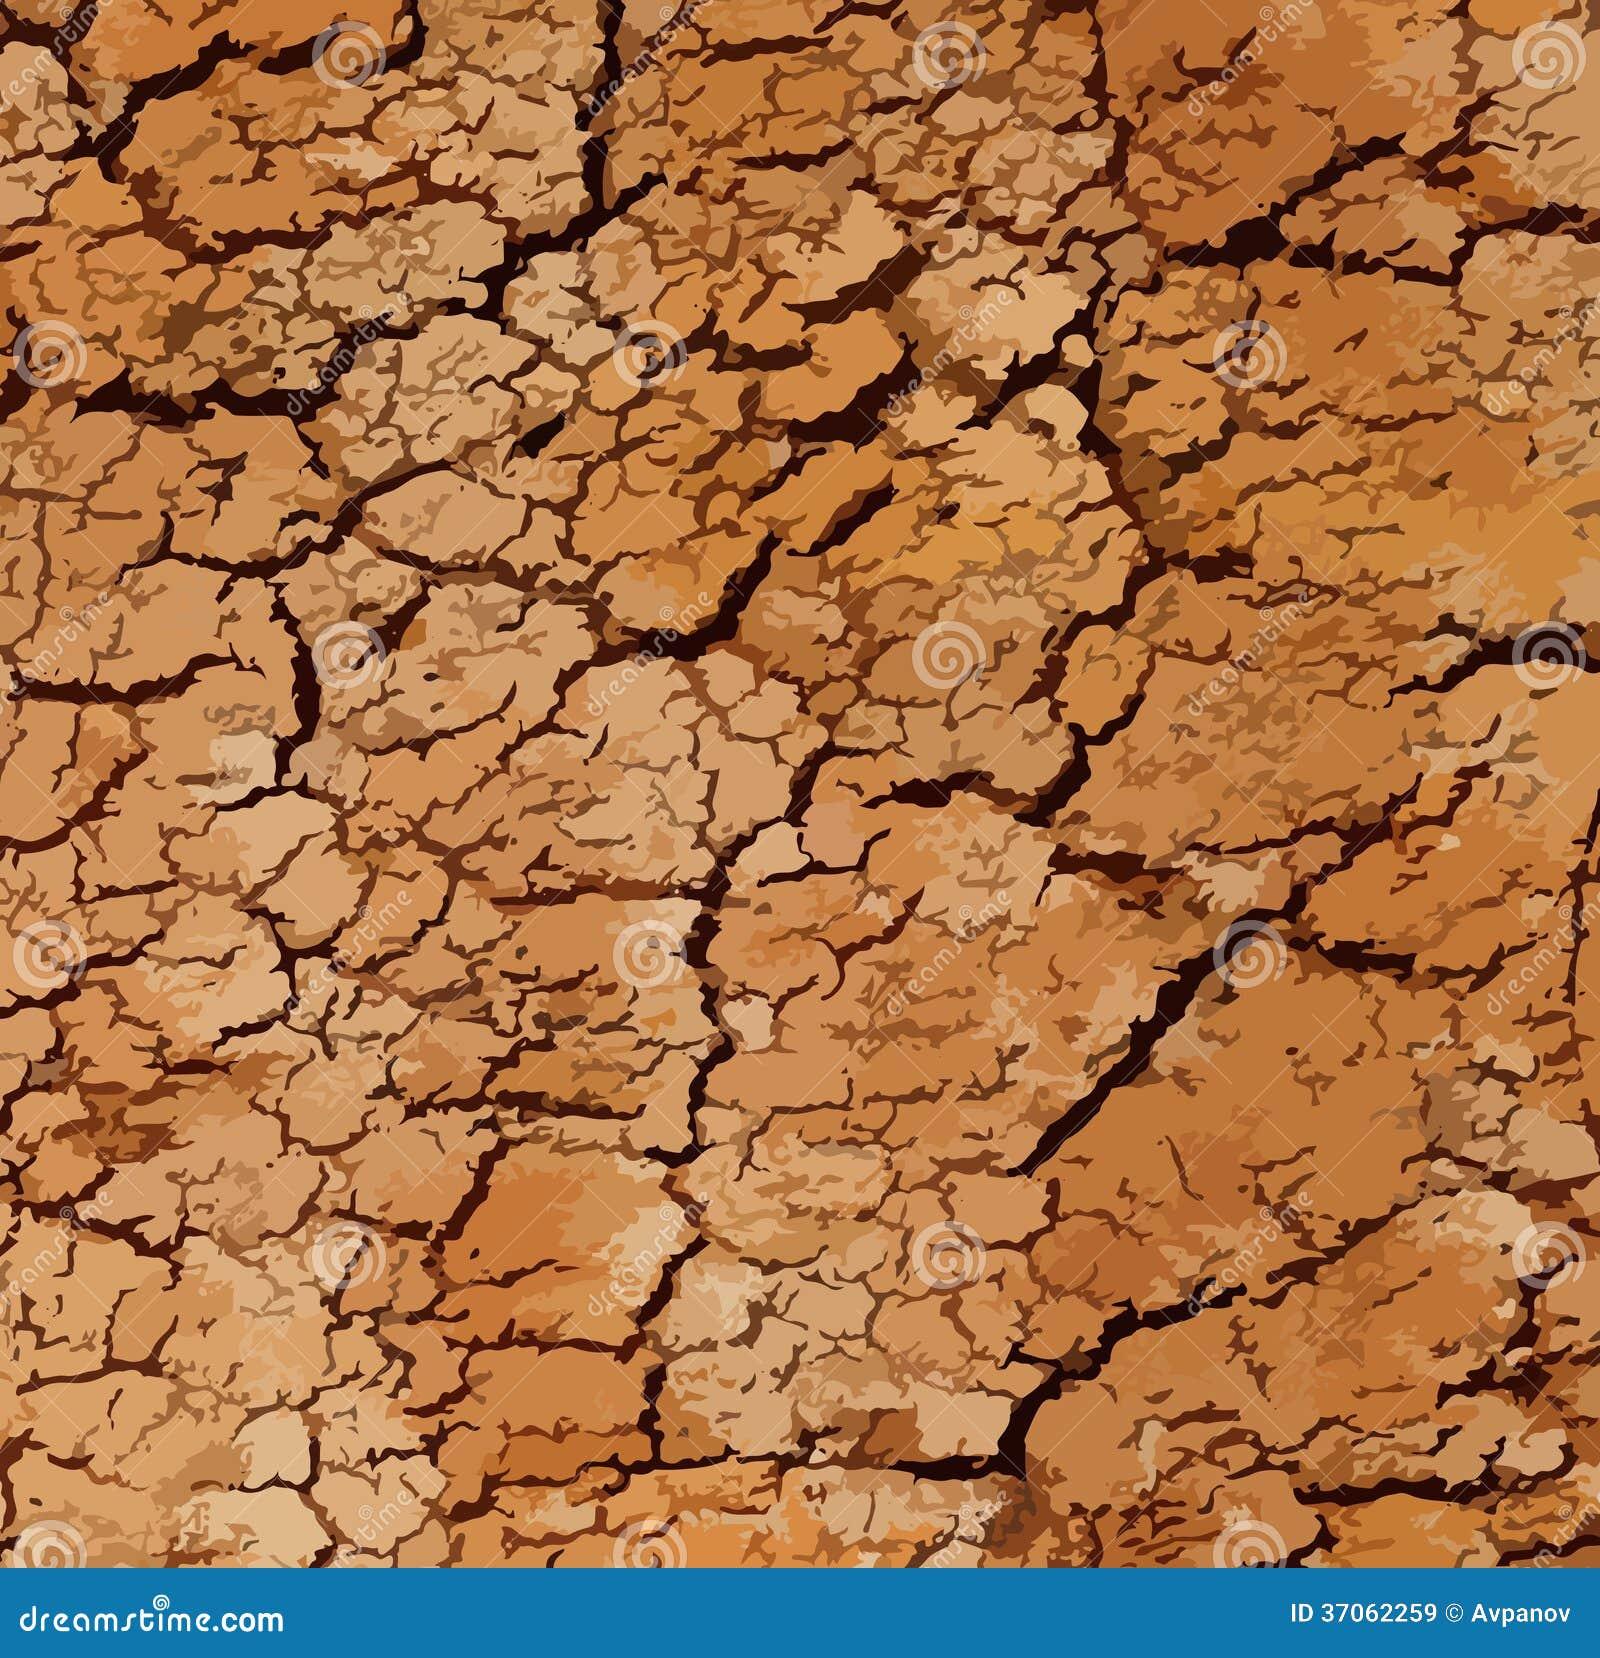 Soil texture vector